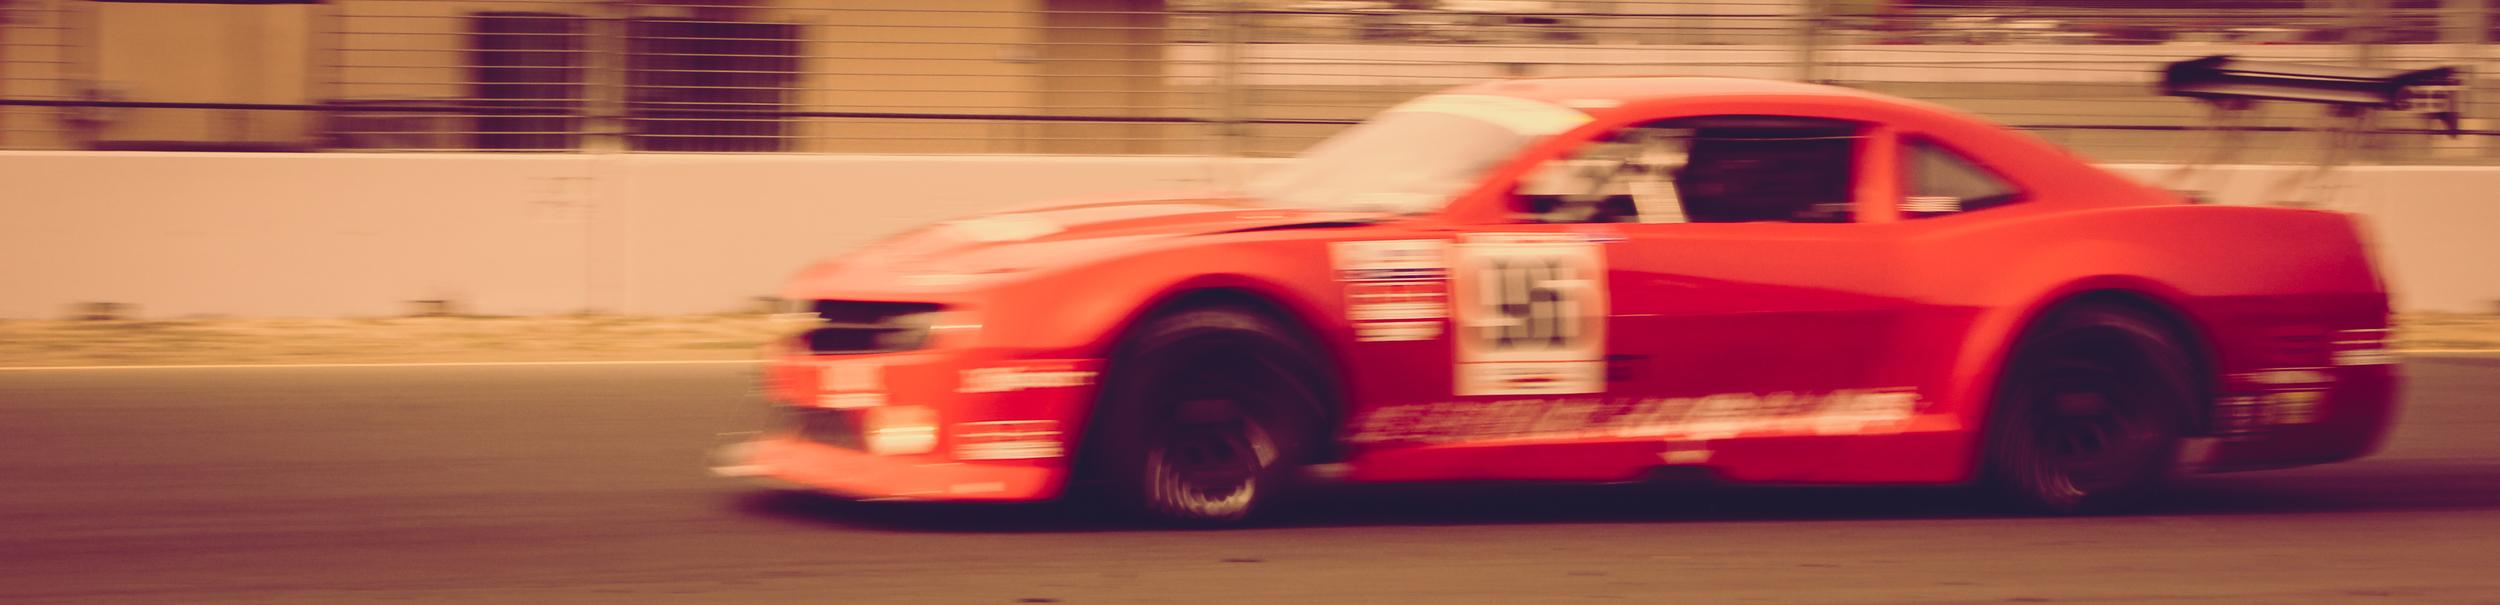 2015-10_RACE_Sonoma_USTCC_Cedric_2792.jpg